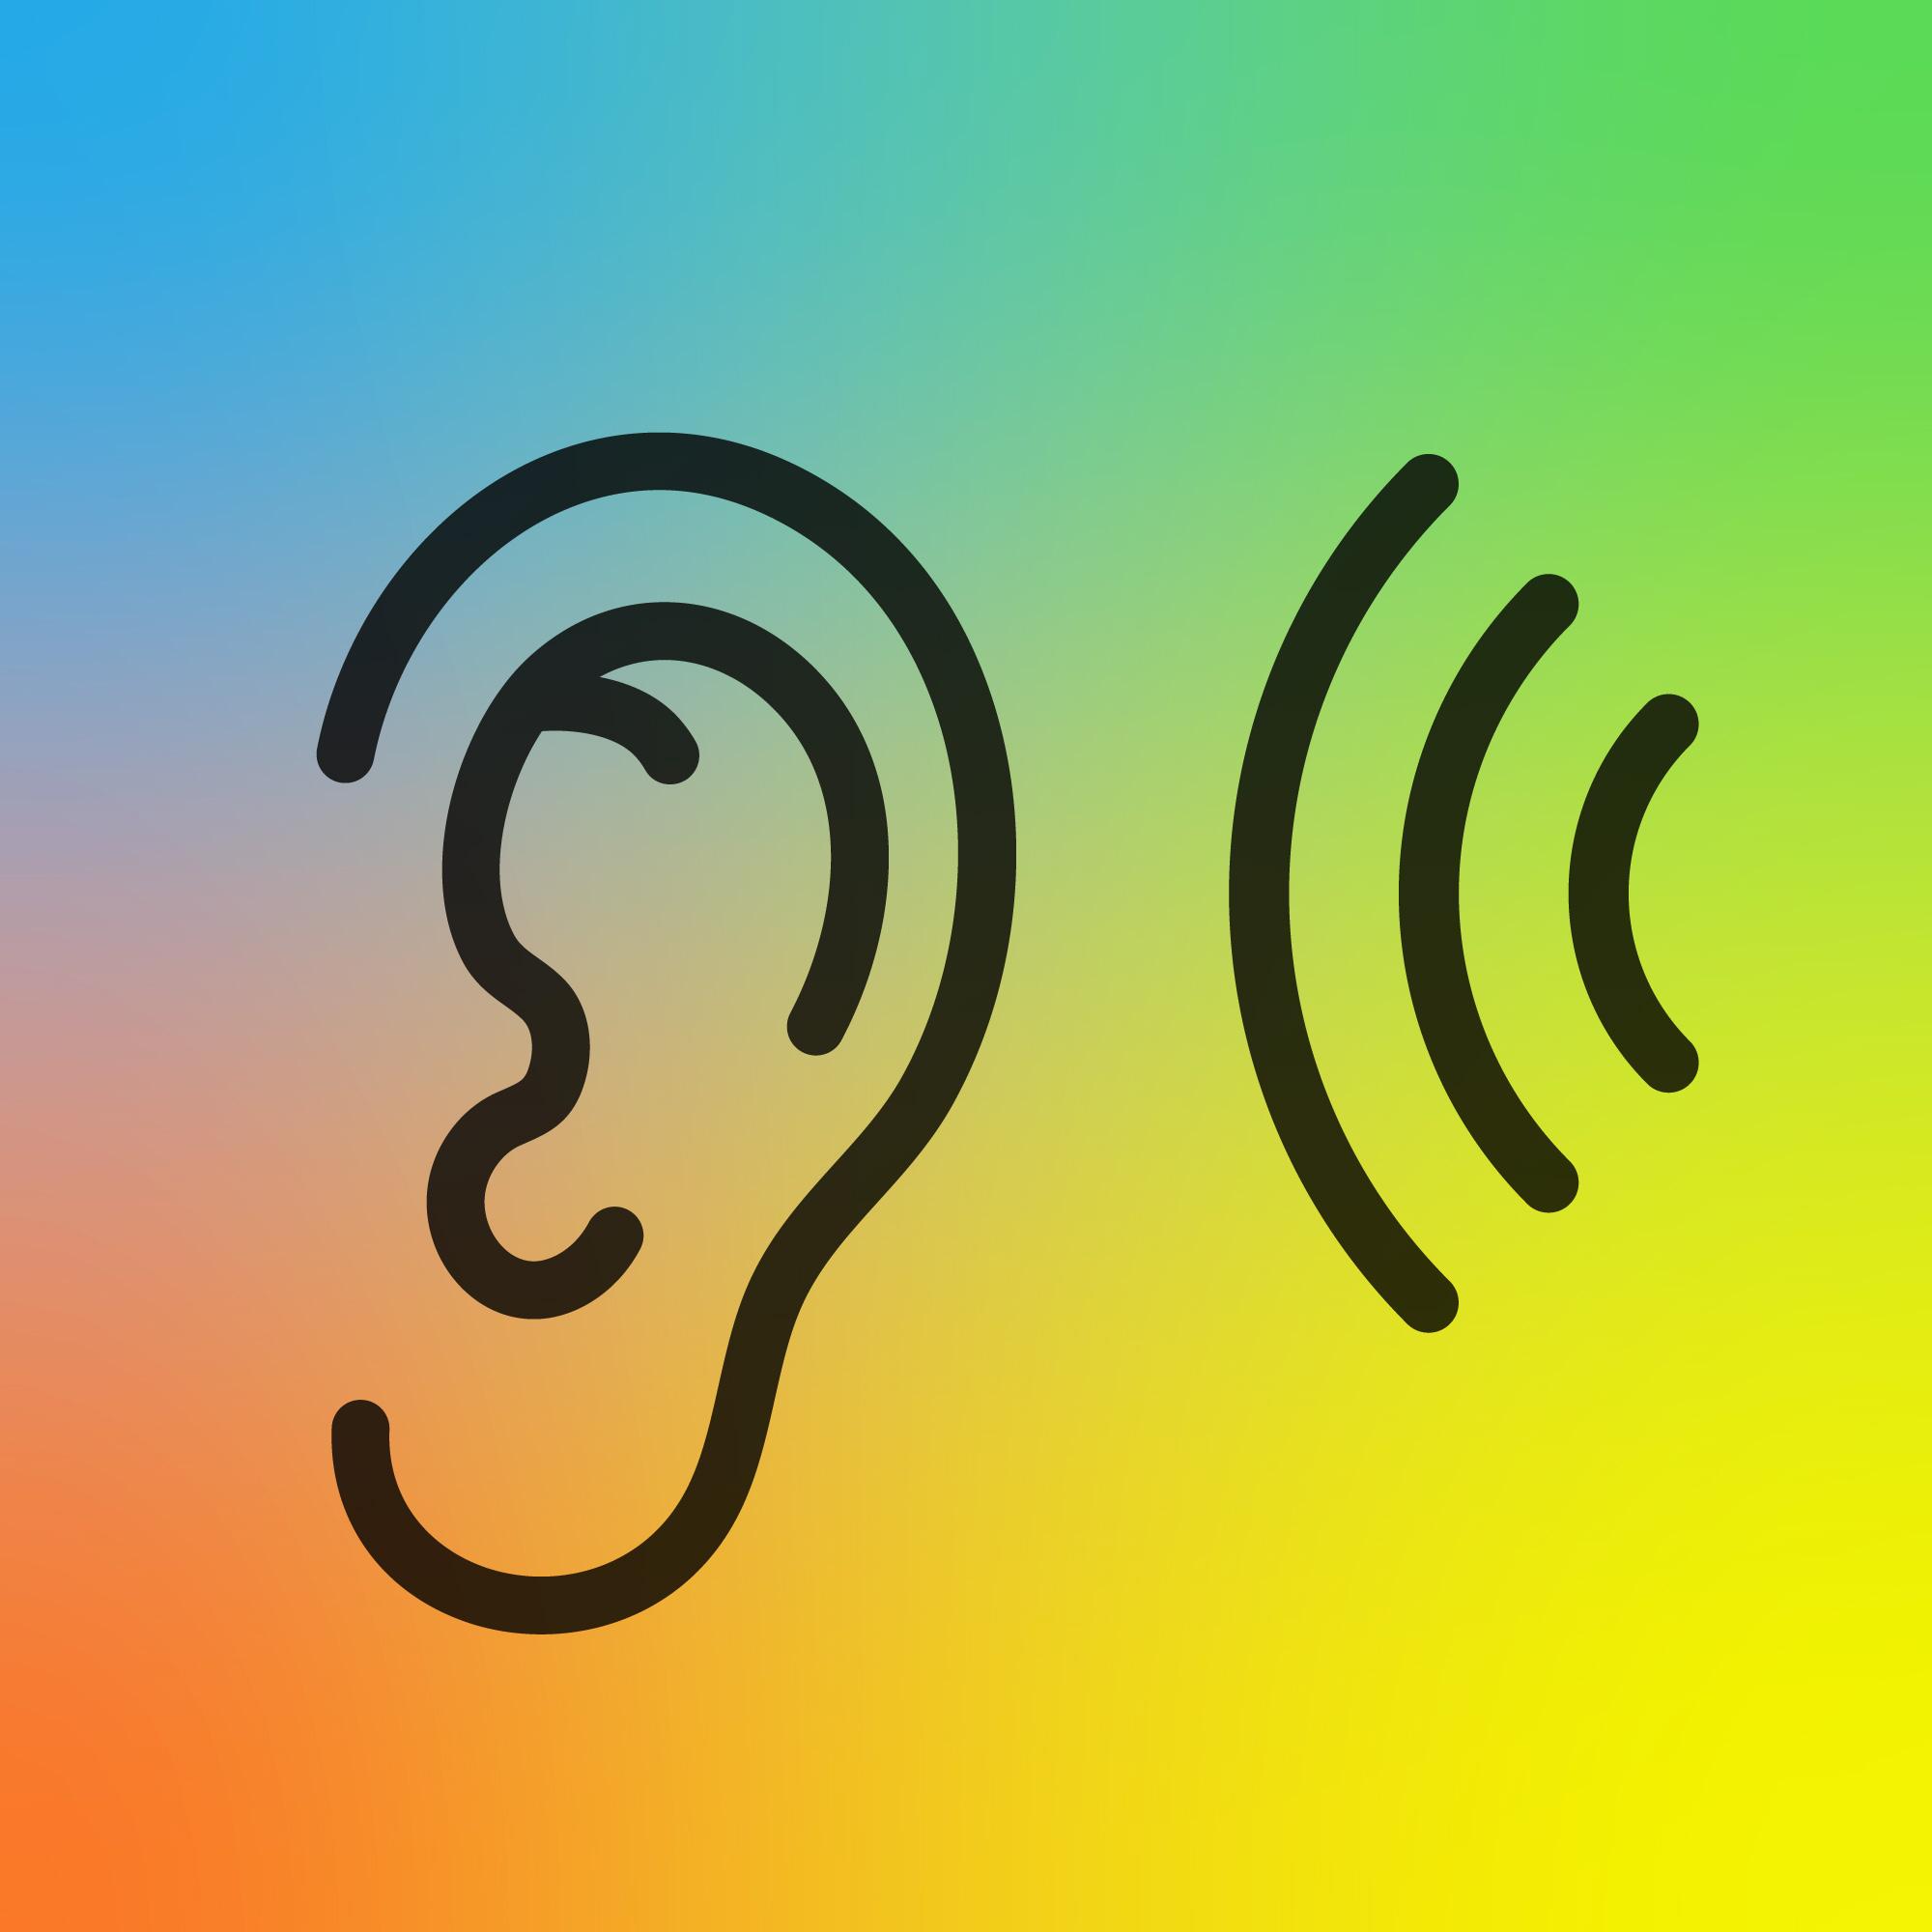 Astute Graphics' BIG Listen 2020